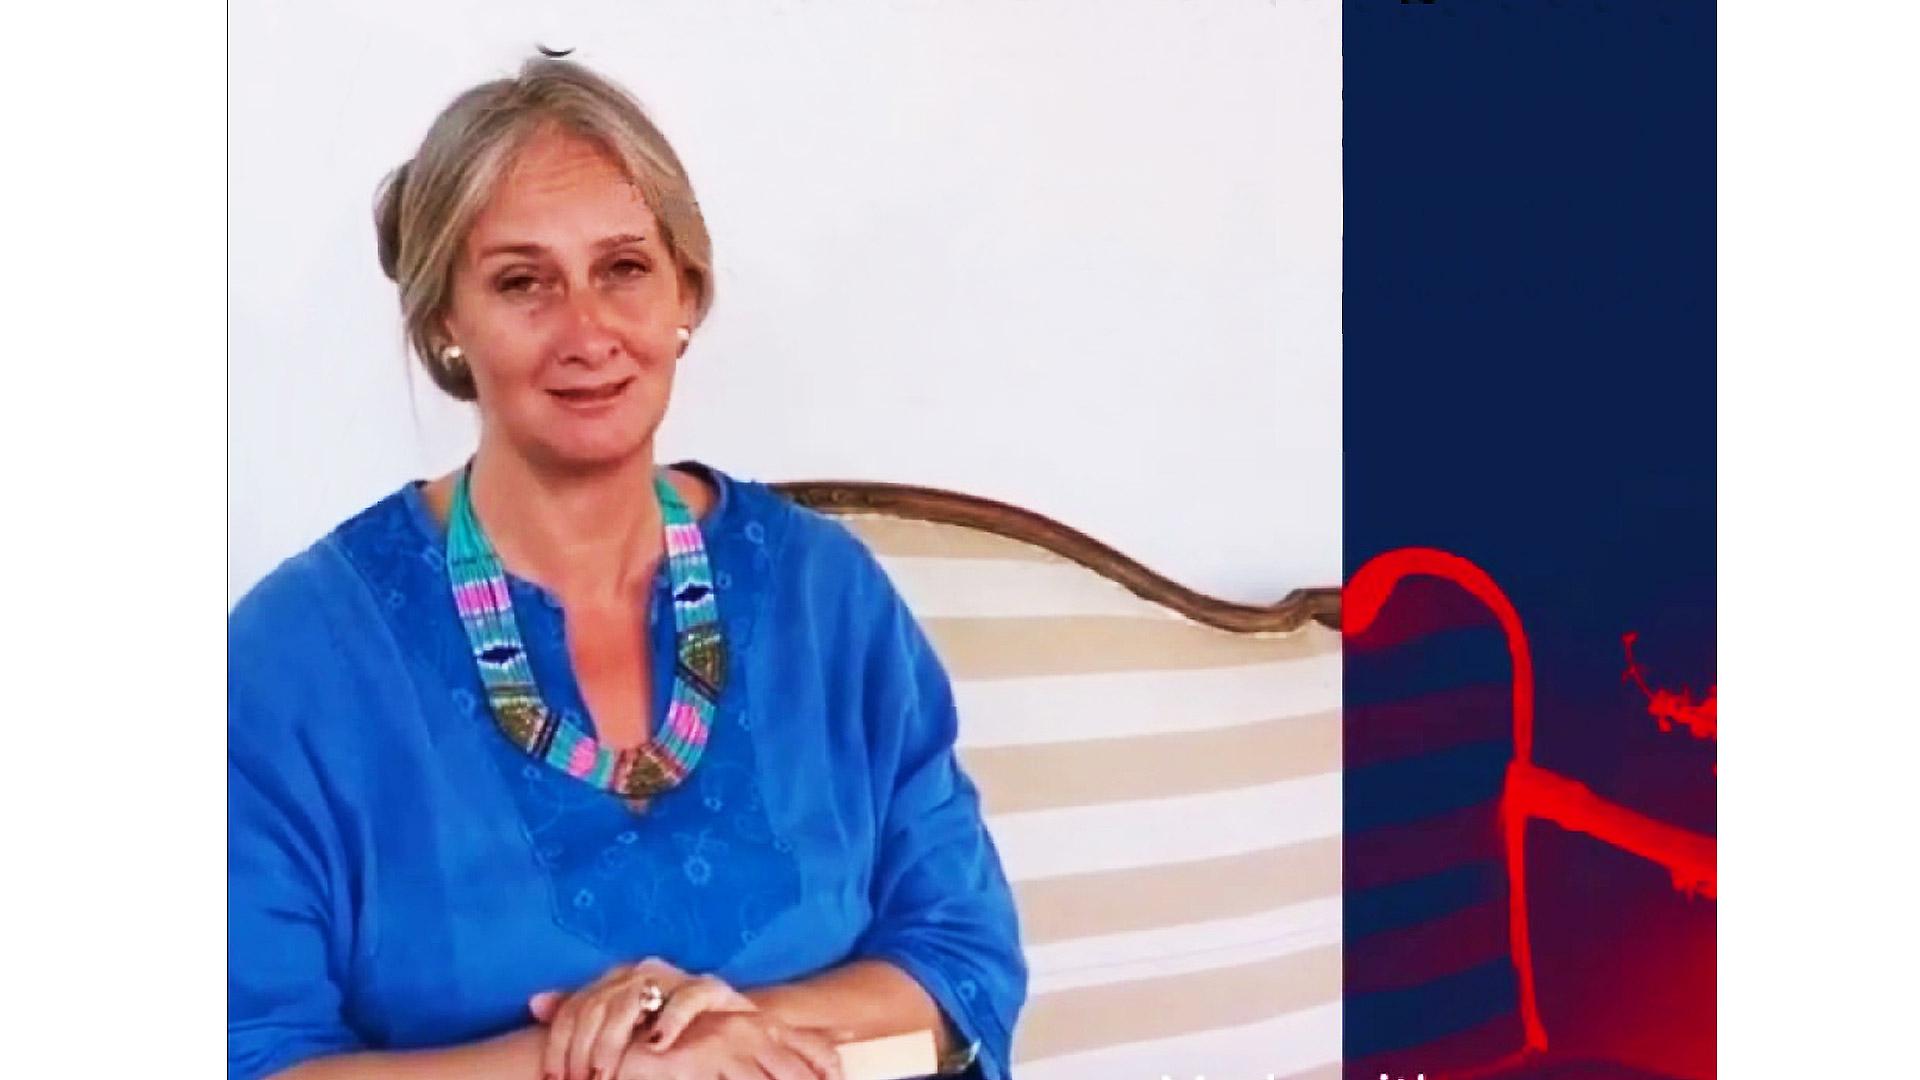 Chiara Modìca Donà delle Rose - Direttrice Biennale internazionale Arte contemporanea sacra